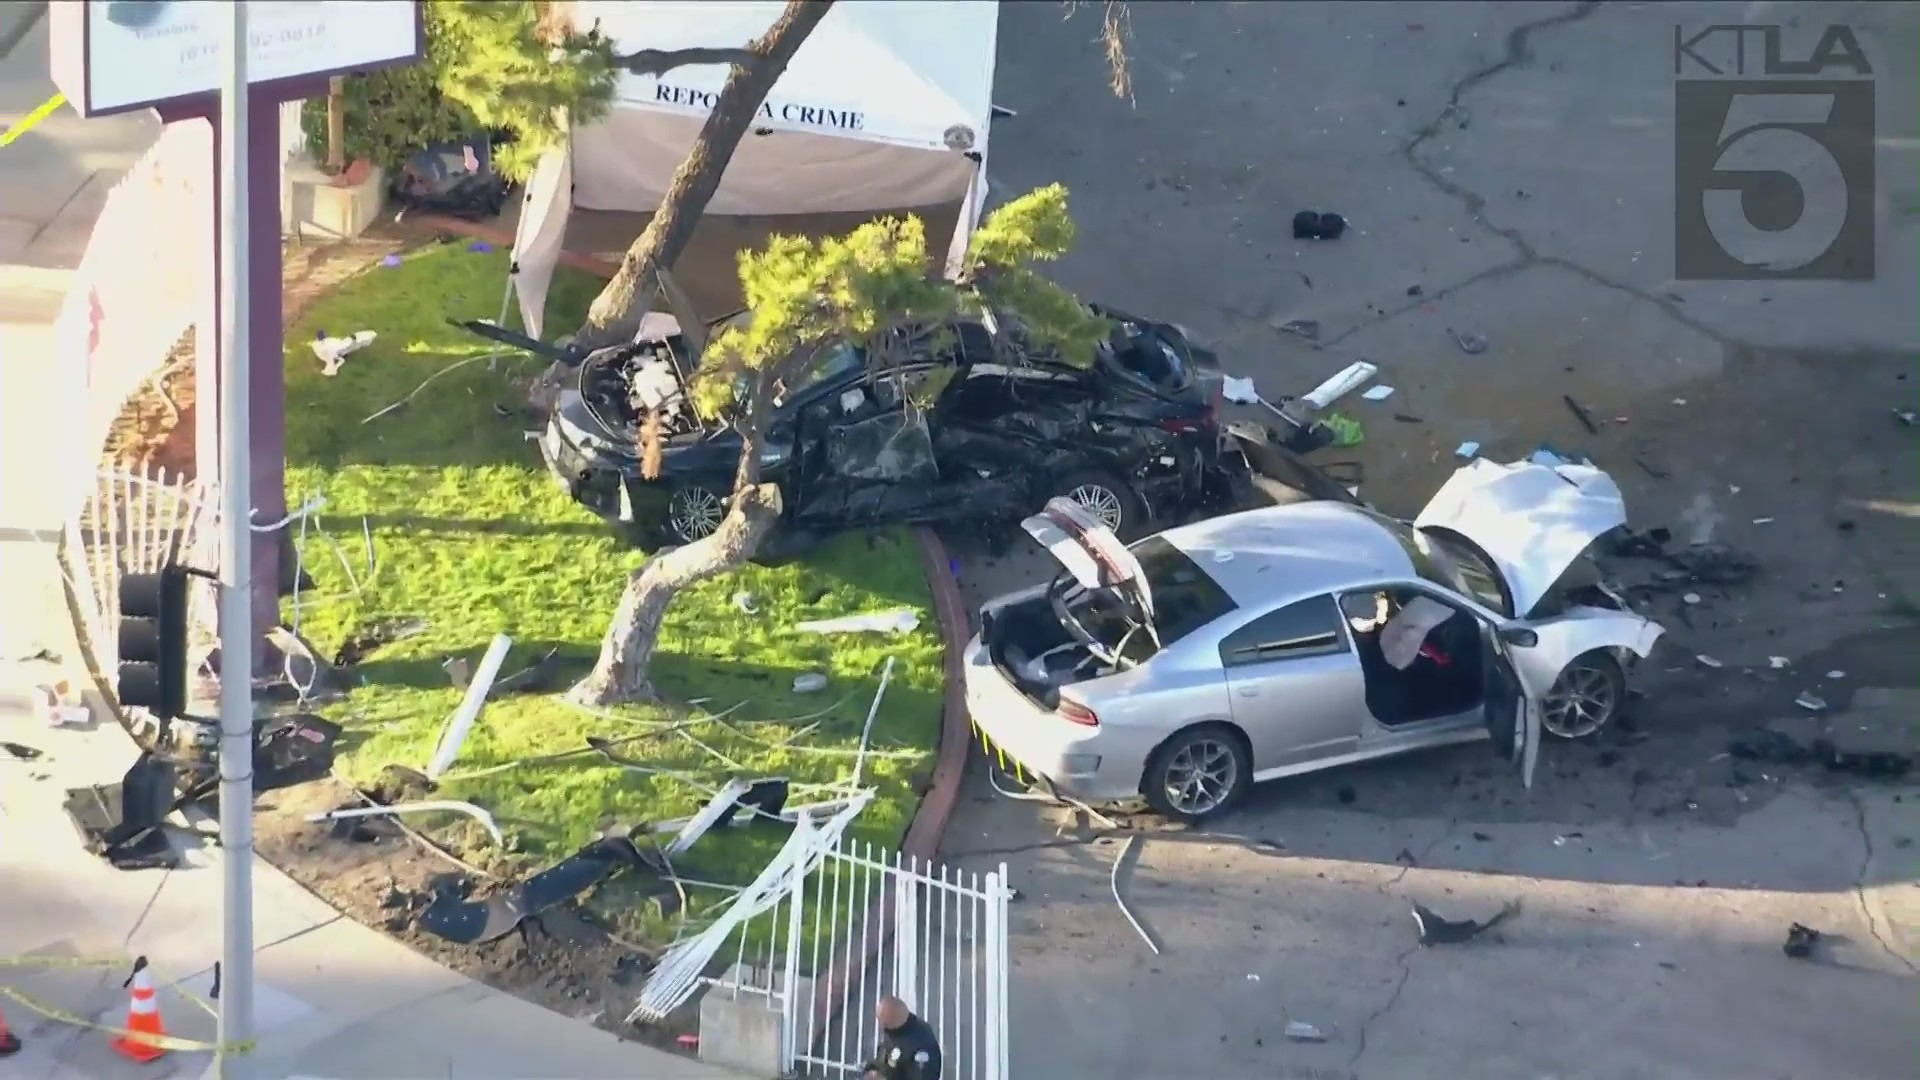 Street Racing Crash in West Hills Killed an Innocent Woman  3/20/21